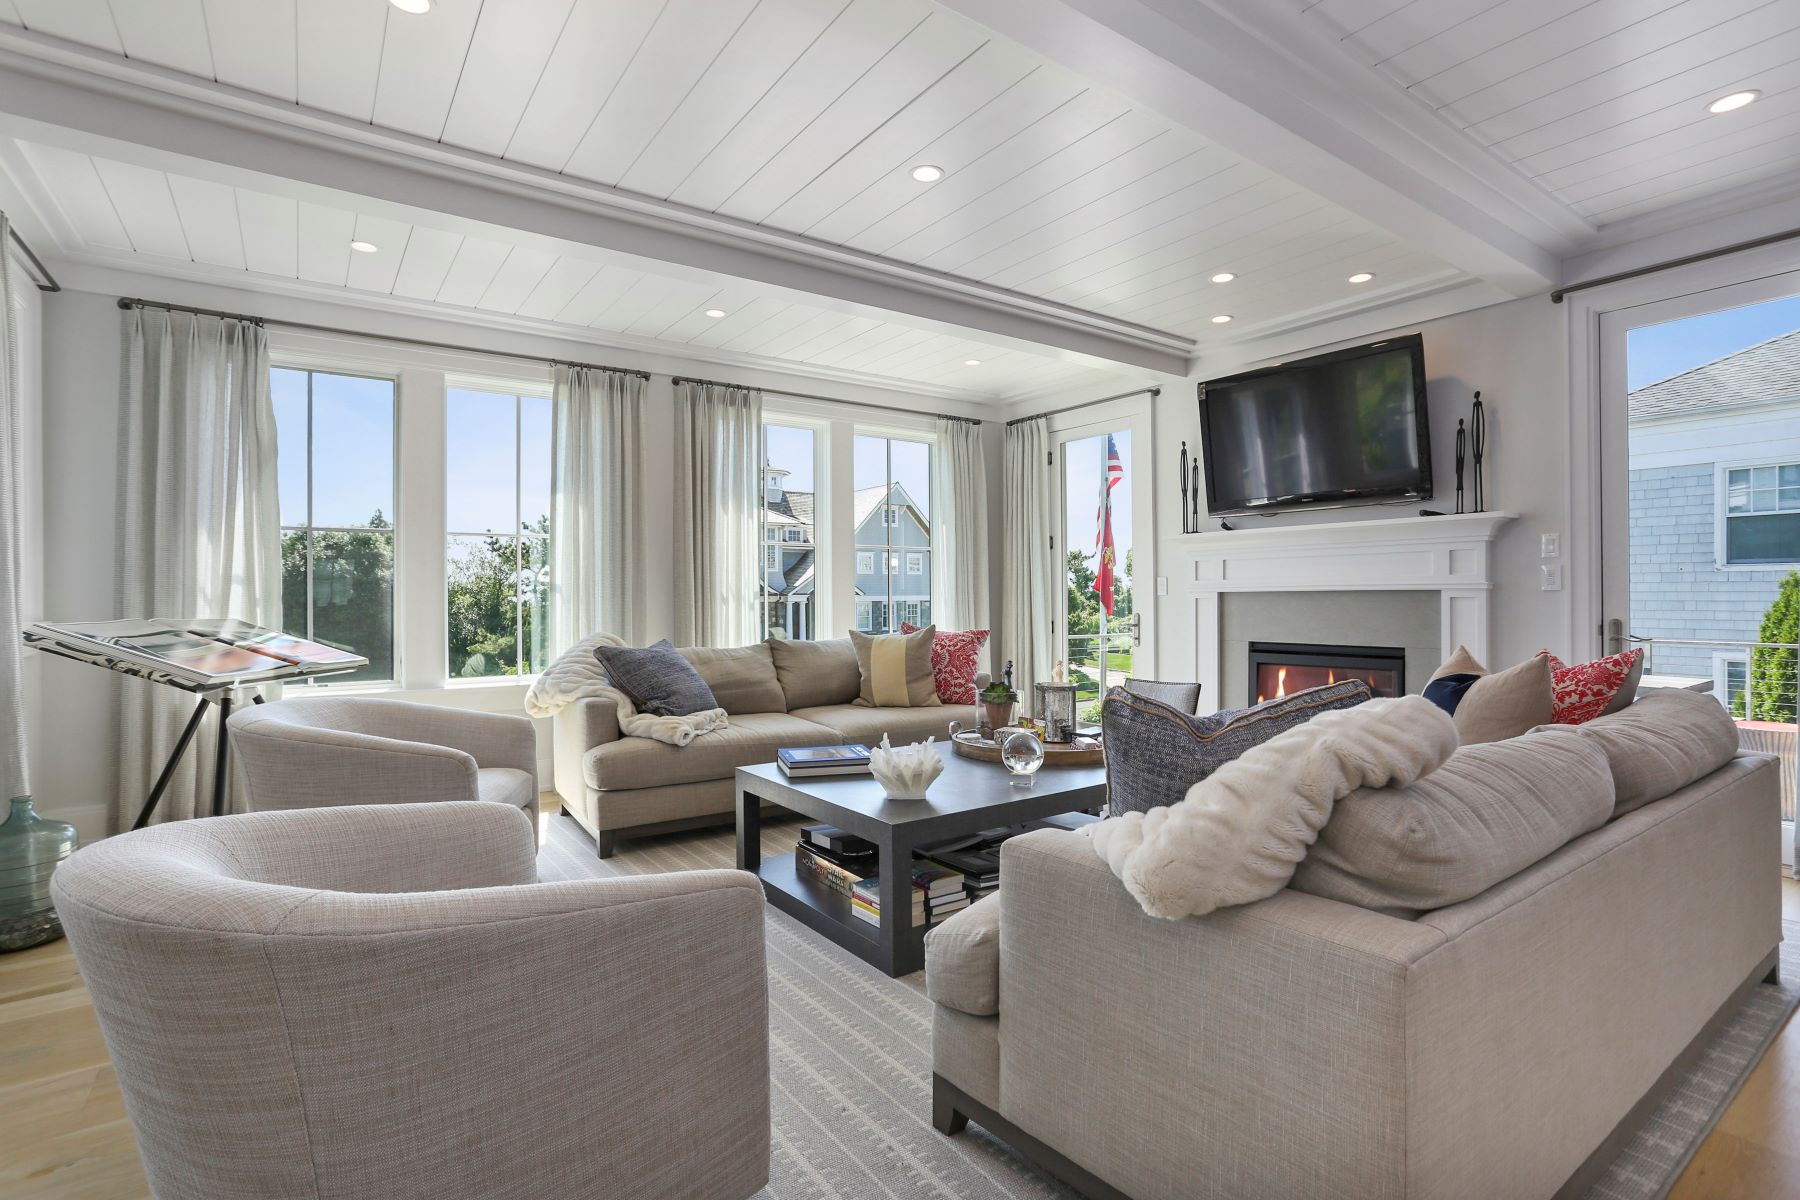 Single Family Homes للـ Sale في Experience Resort Like Living on Saugatuck Island 4 Sandpiper Road, Westport, Connecticut 06880 United States